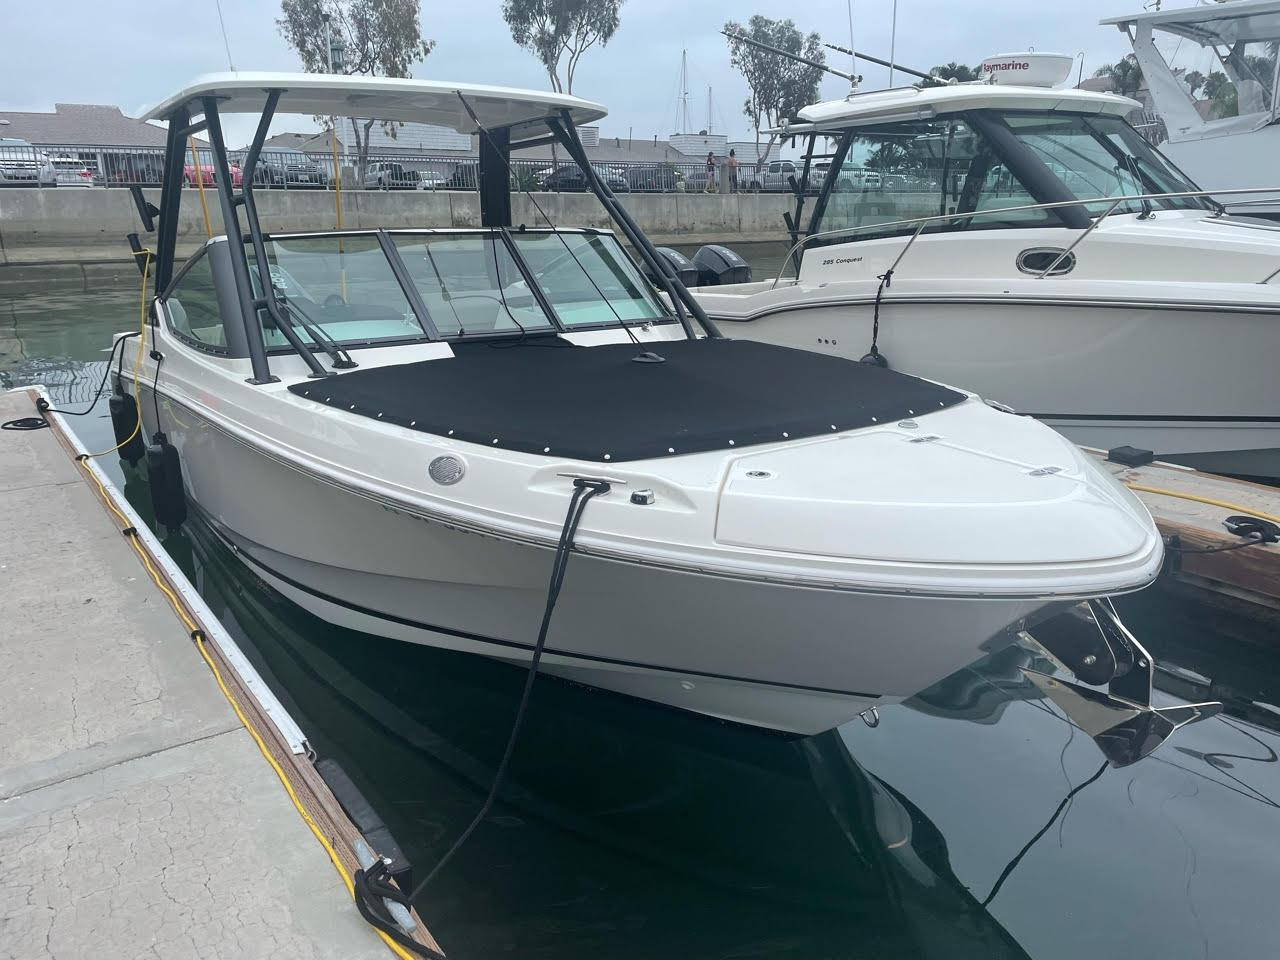 2021 Boston Whaler 240 Vantage #TB1419RL inventory image at Sun Country Coastal in Newport Beach